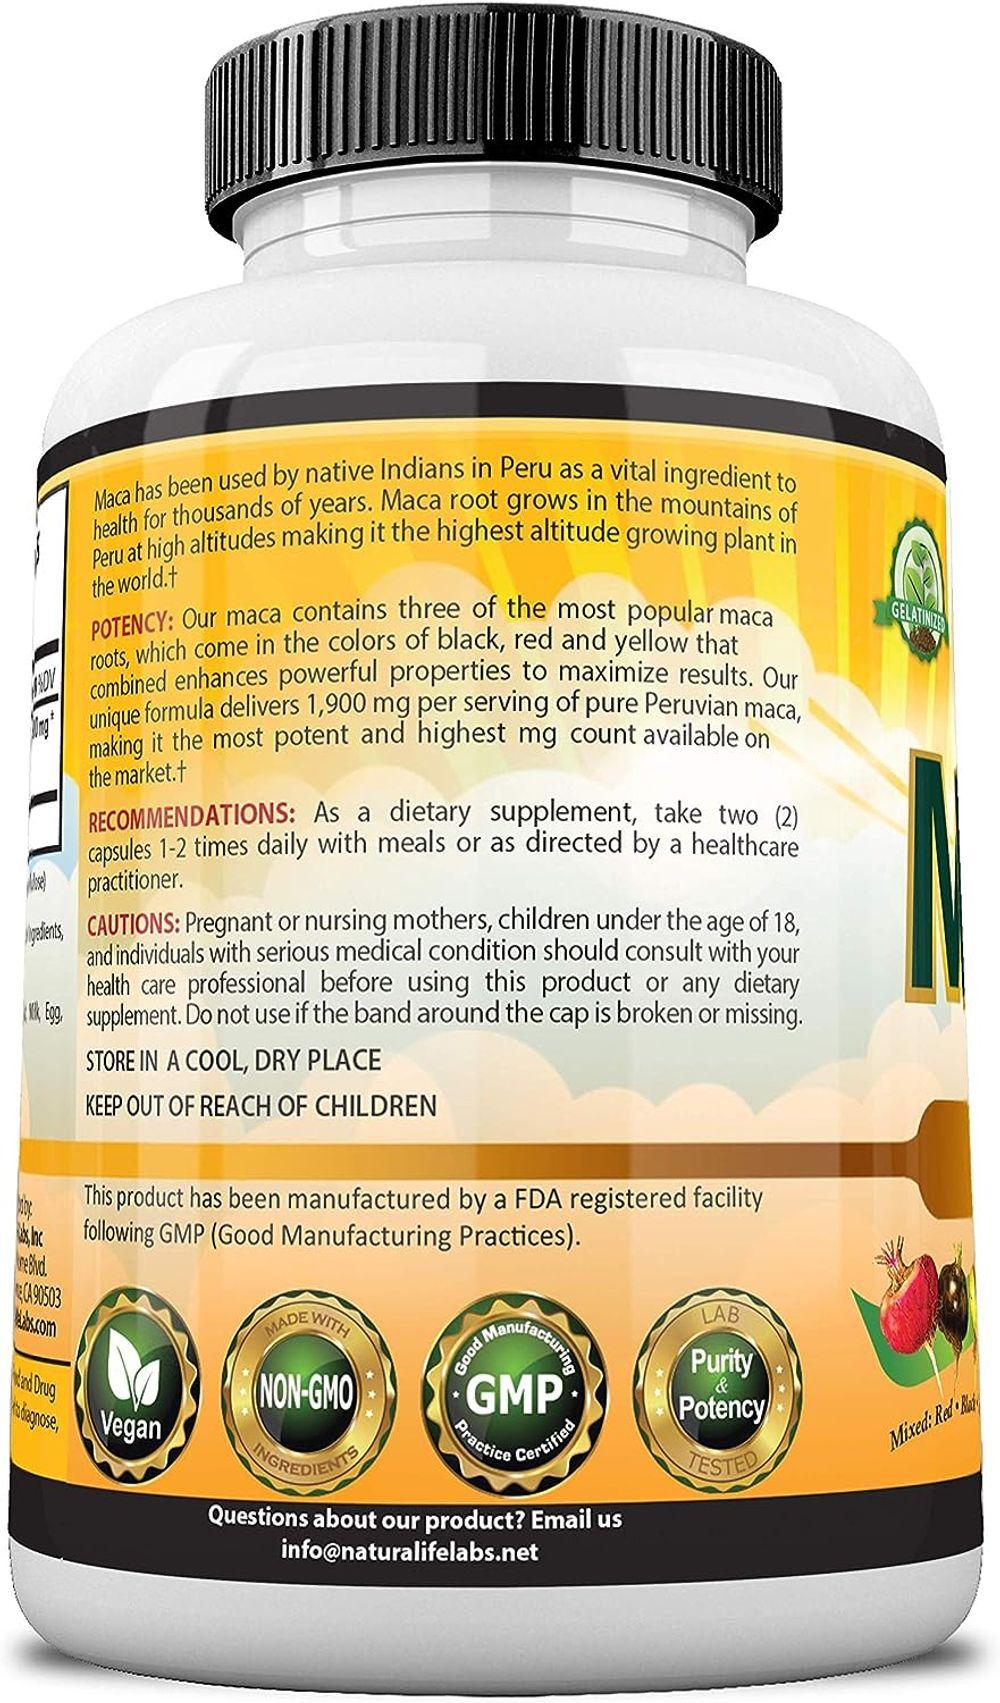 Organic Maca Root Black, Red, Yellow 1900 MG per Serving - 150 Vegan Capsules Peruvian Maca Root Gelatinized 100% Pure Non-GMO Supports Reproductive Health Natural Energizer